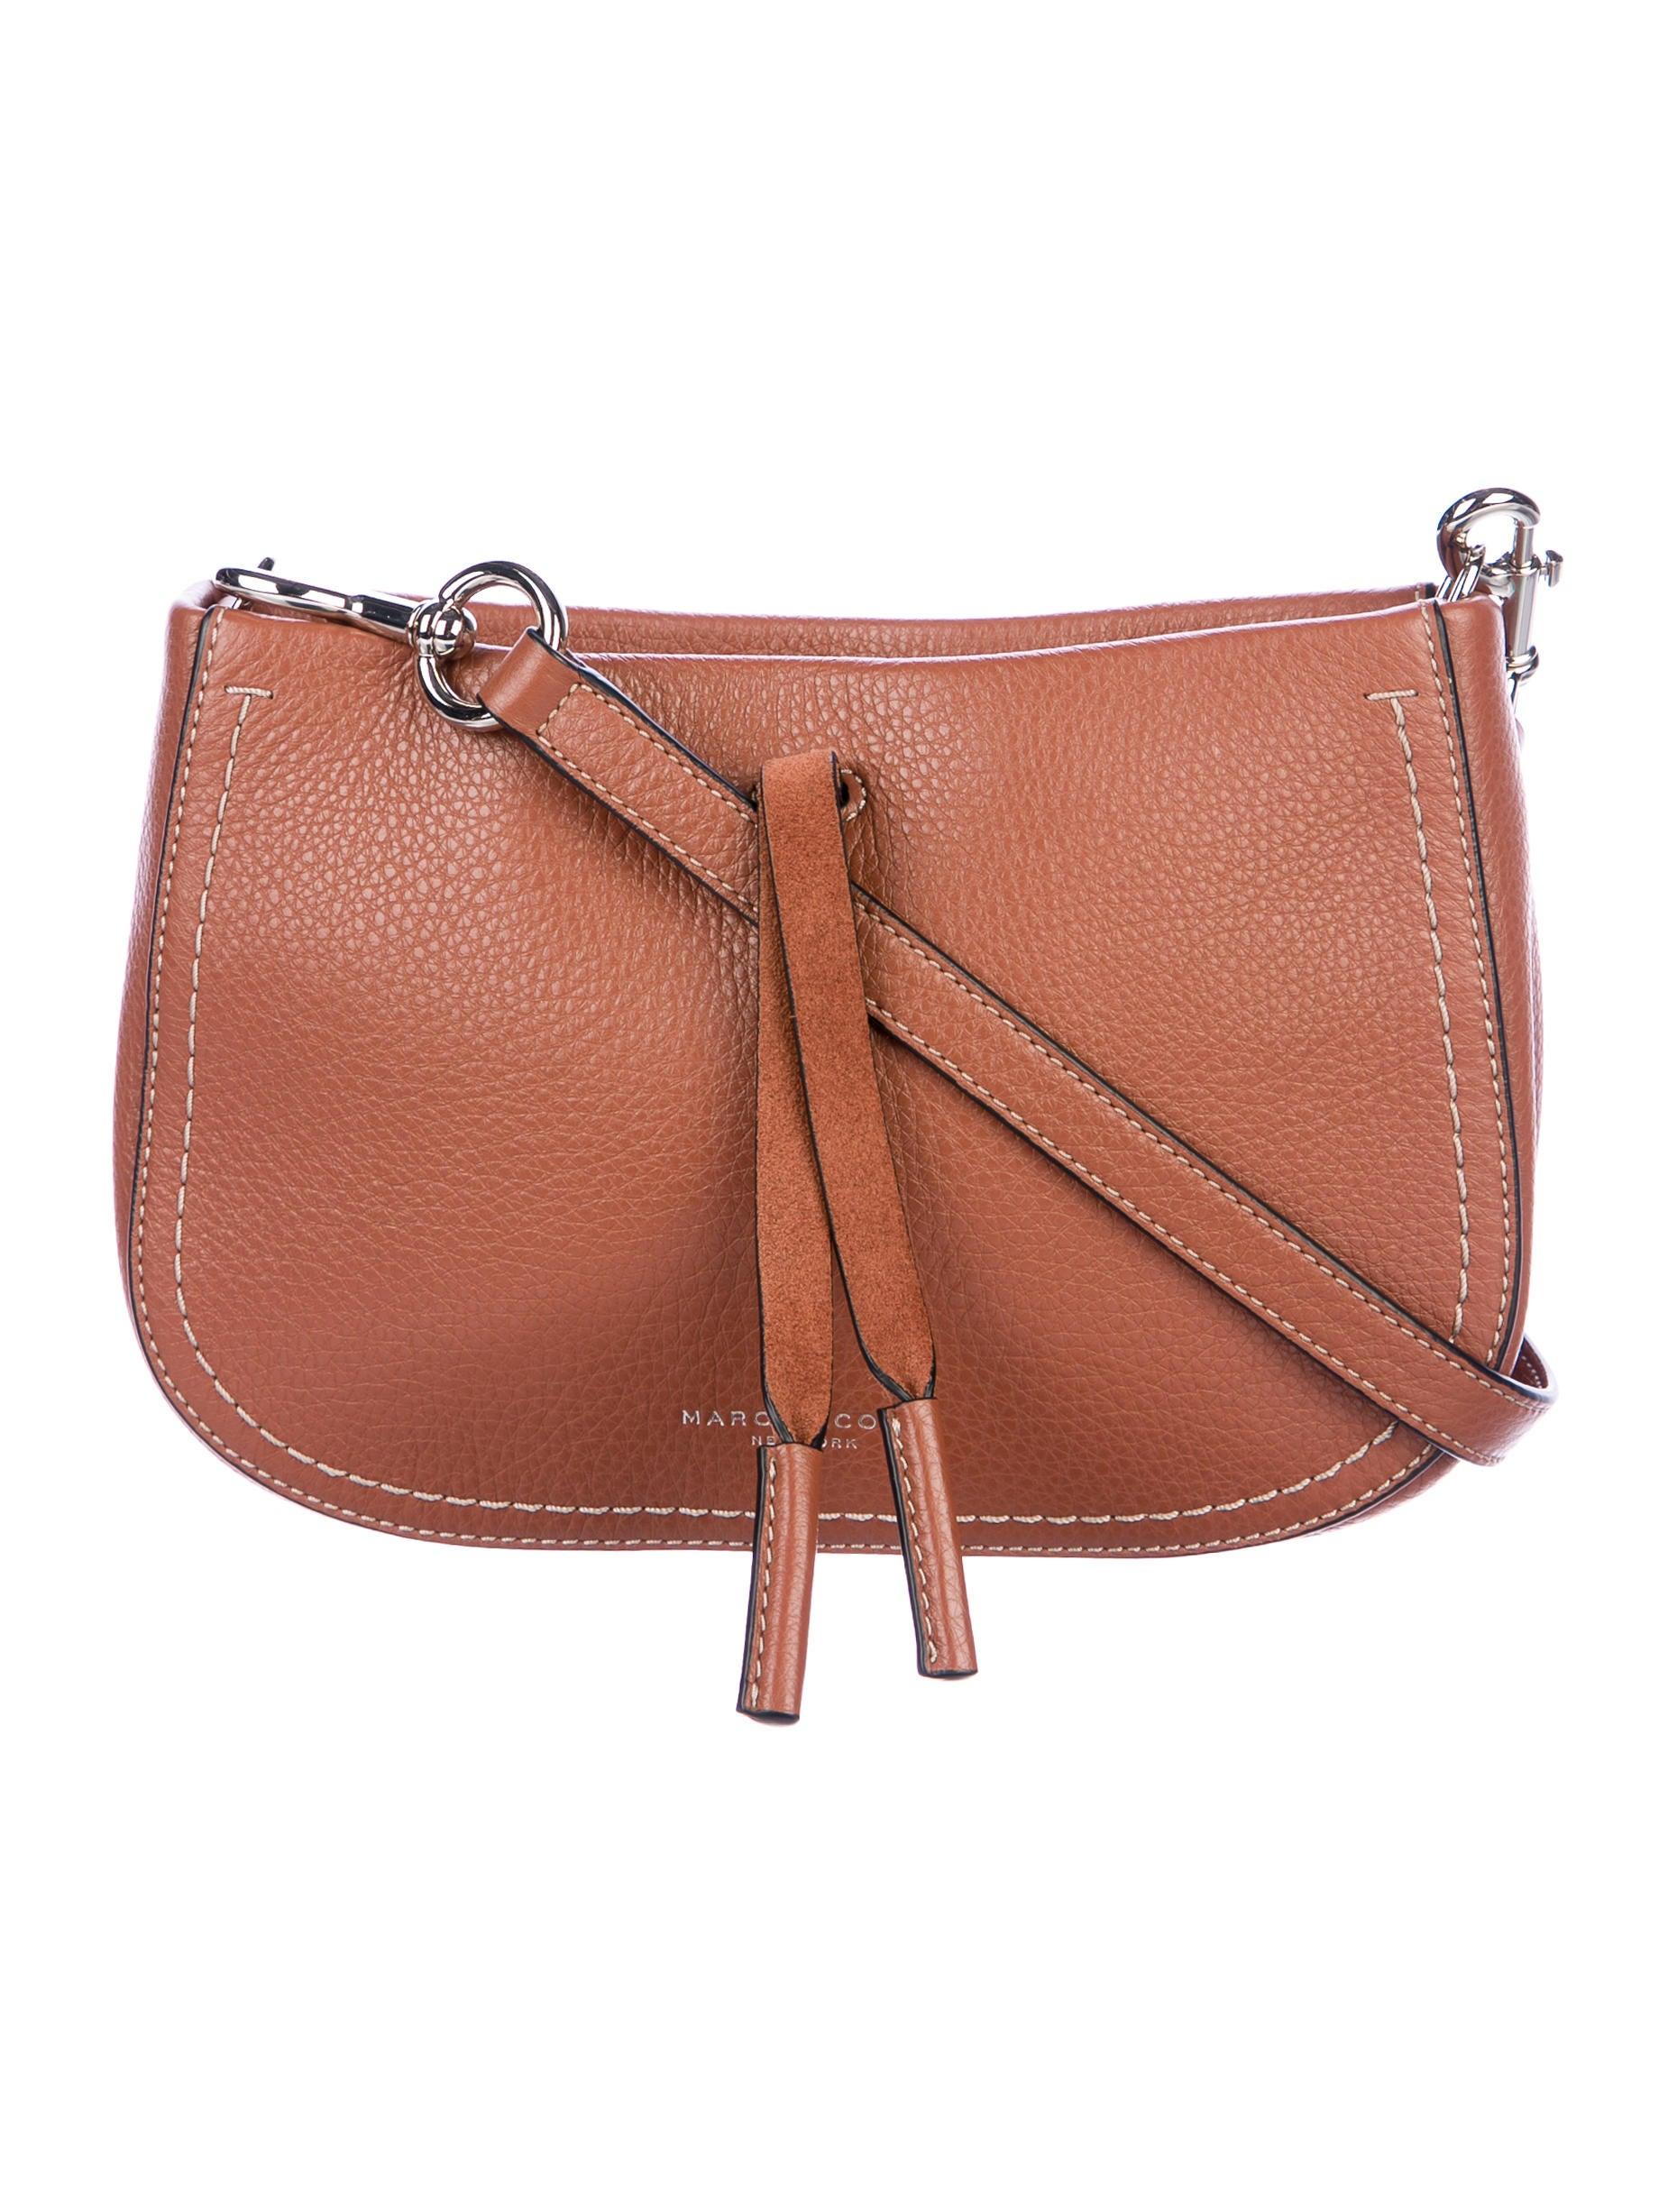 Women · Handbags  Marc Jacobs Maverick Crossbody Bag. Maverick Crossbody Bag 0f99fcbaaae6a